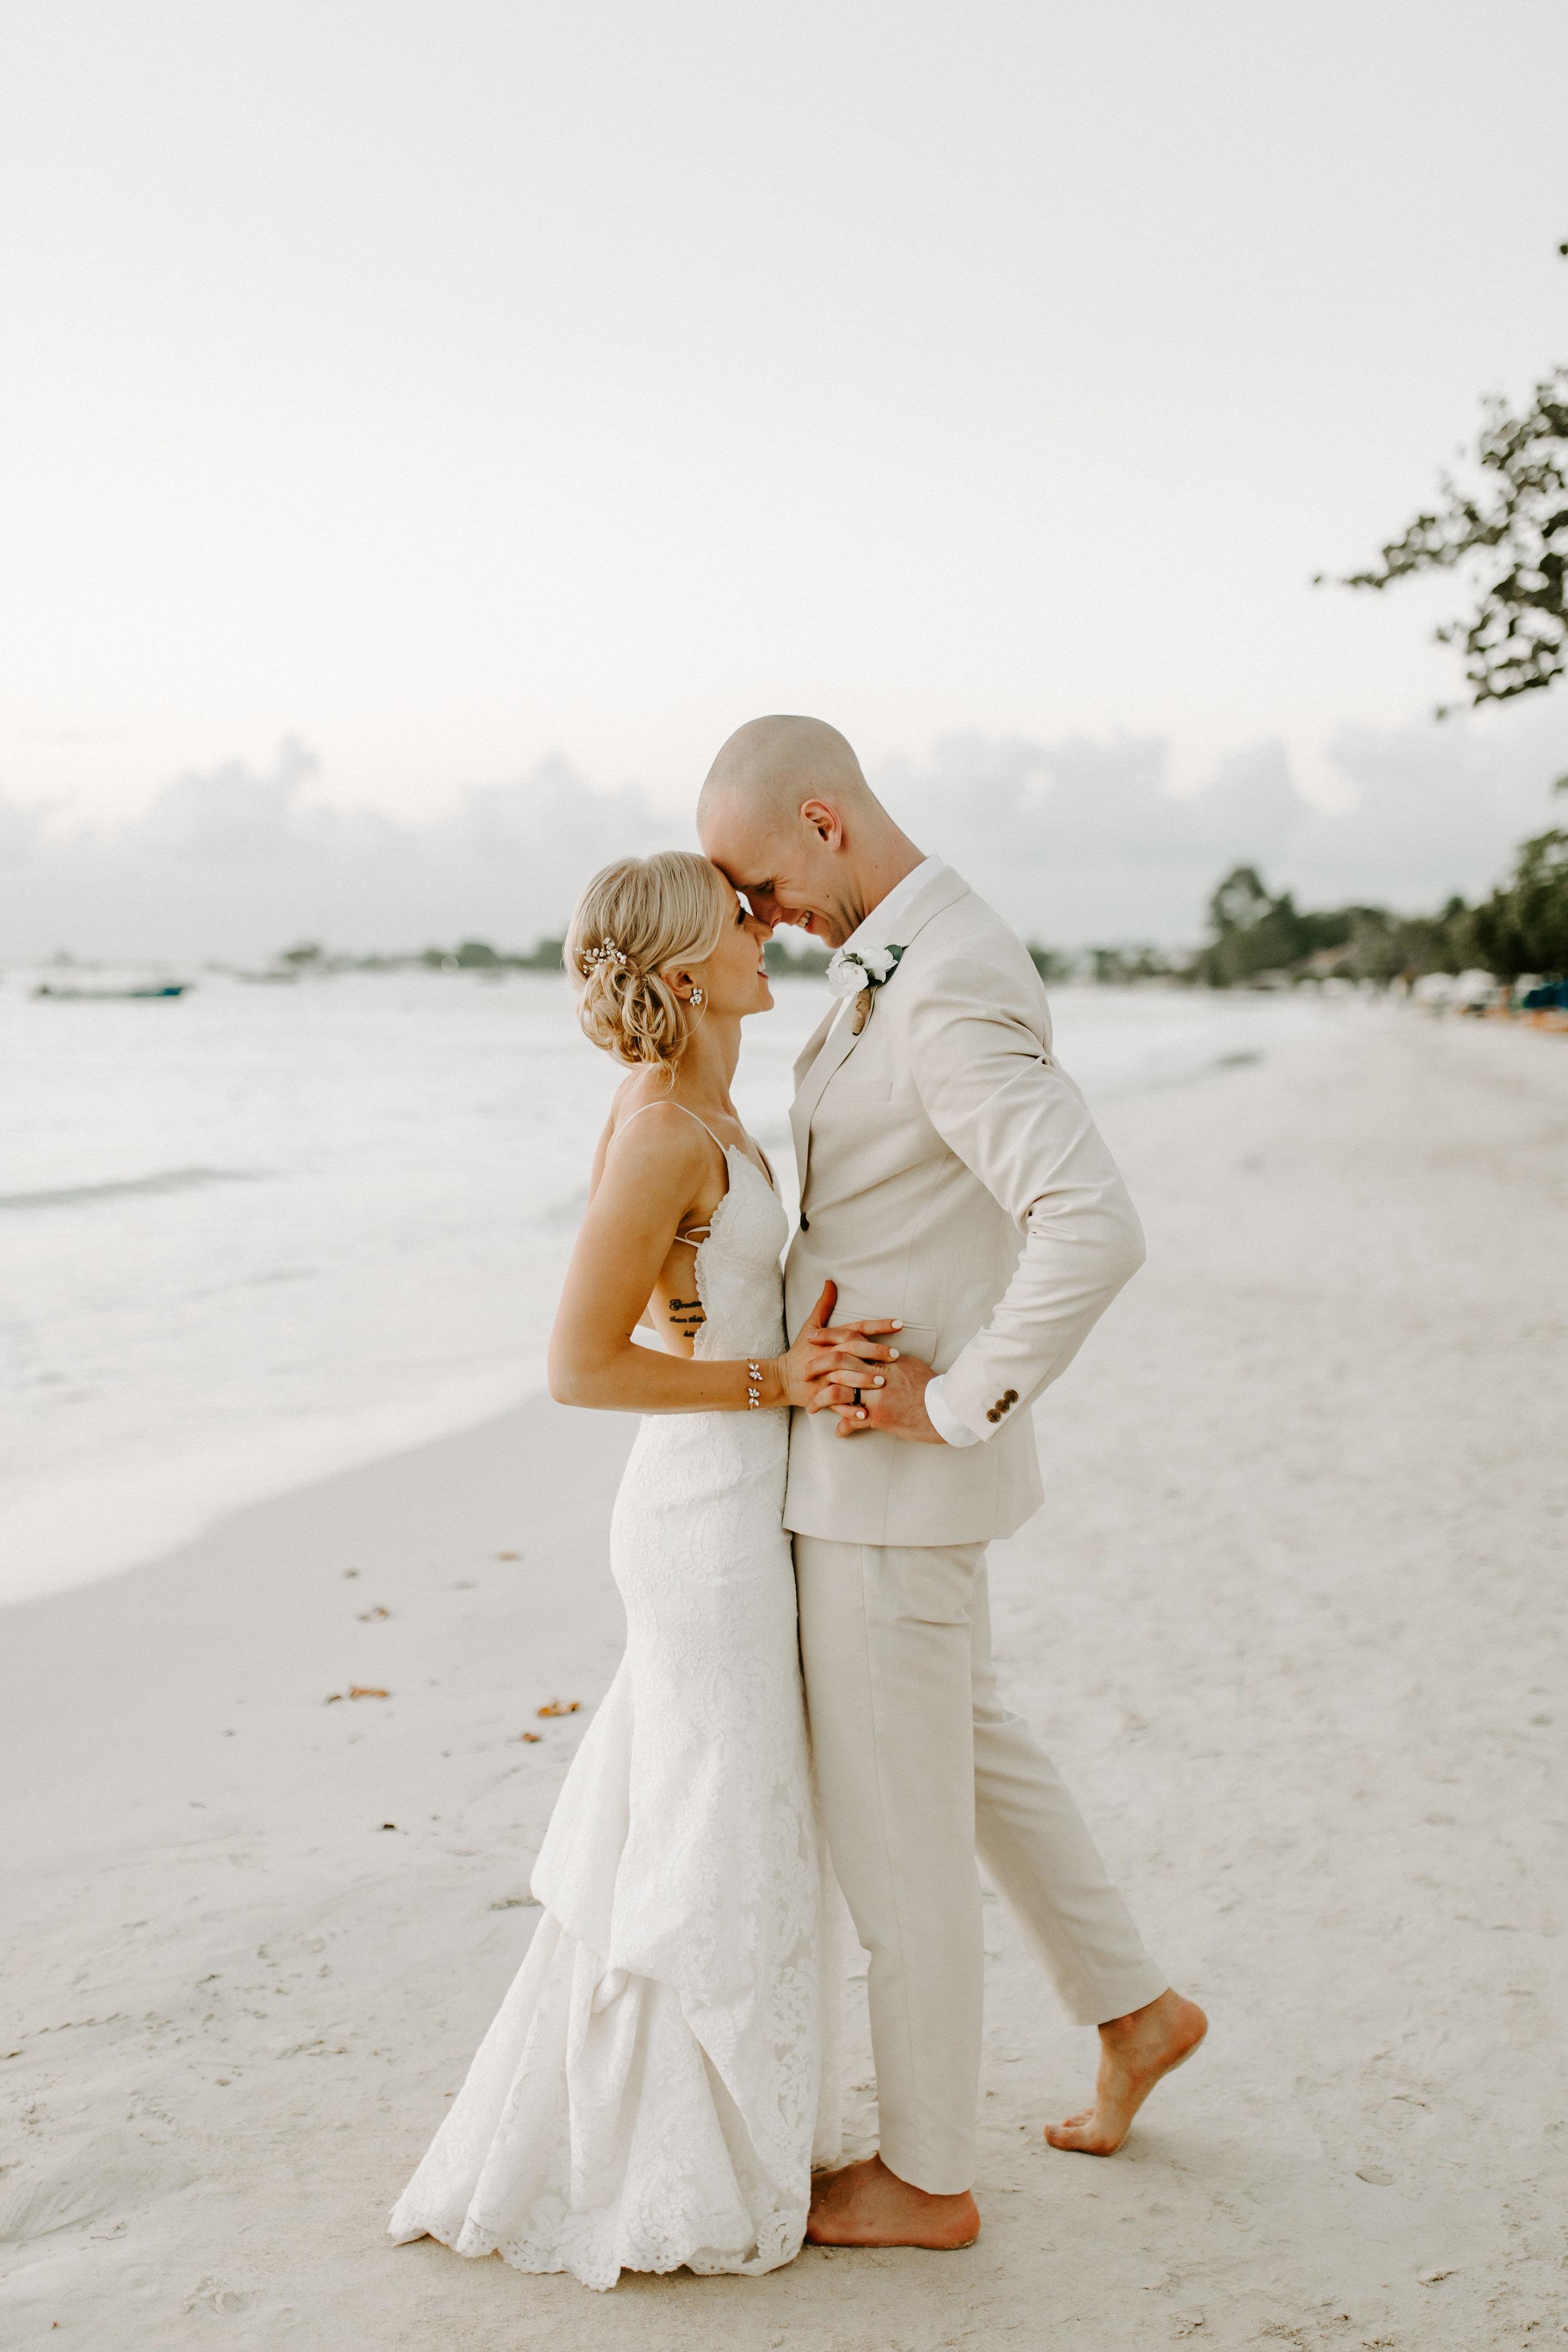 destination wedding, beach wedding, jamaican wedding, jamaica wedding, beach bride, backless dress, backless wedding dress, define fettle